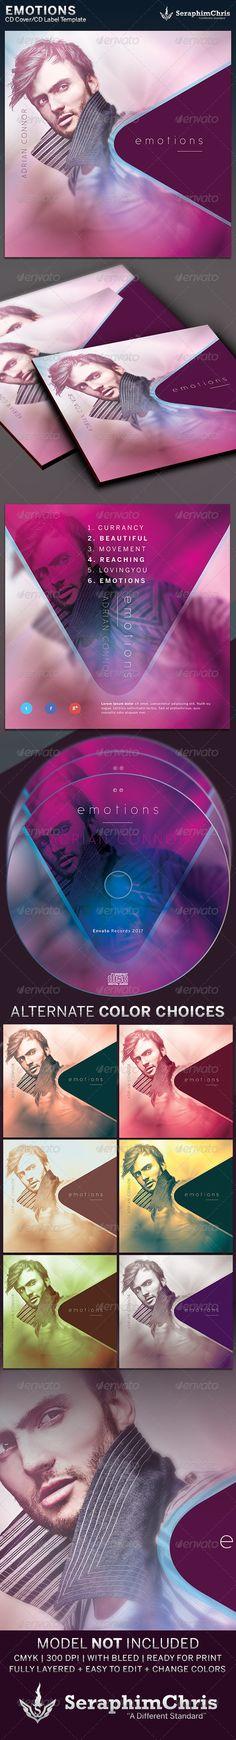 Emotions: CD Cover Artwork Template - CD & DVD Artwork Print Templates